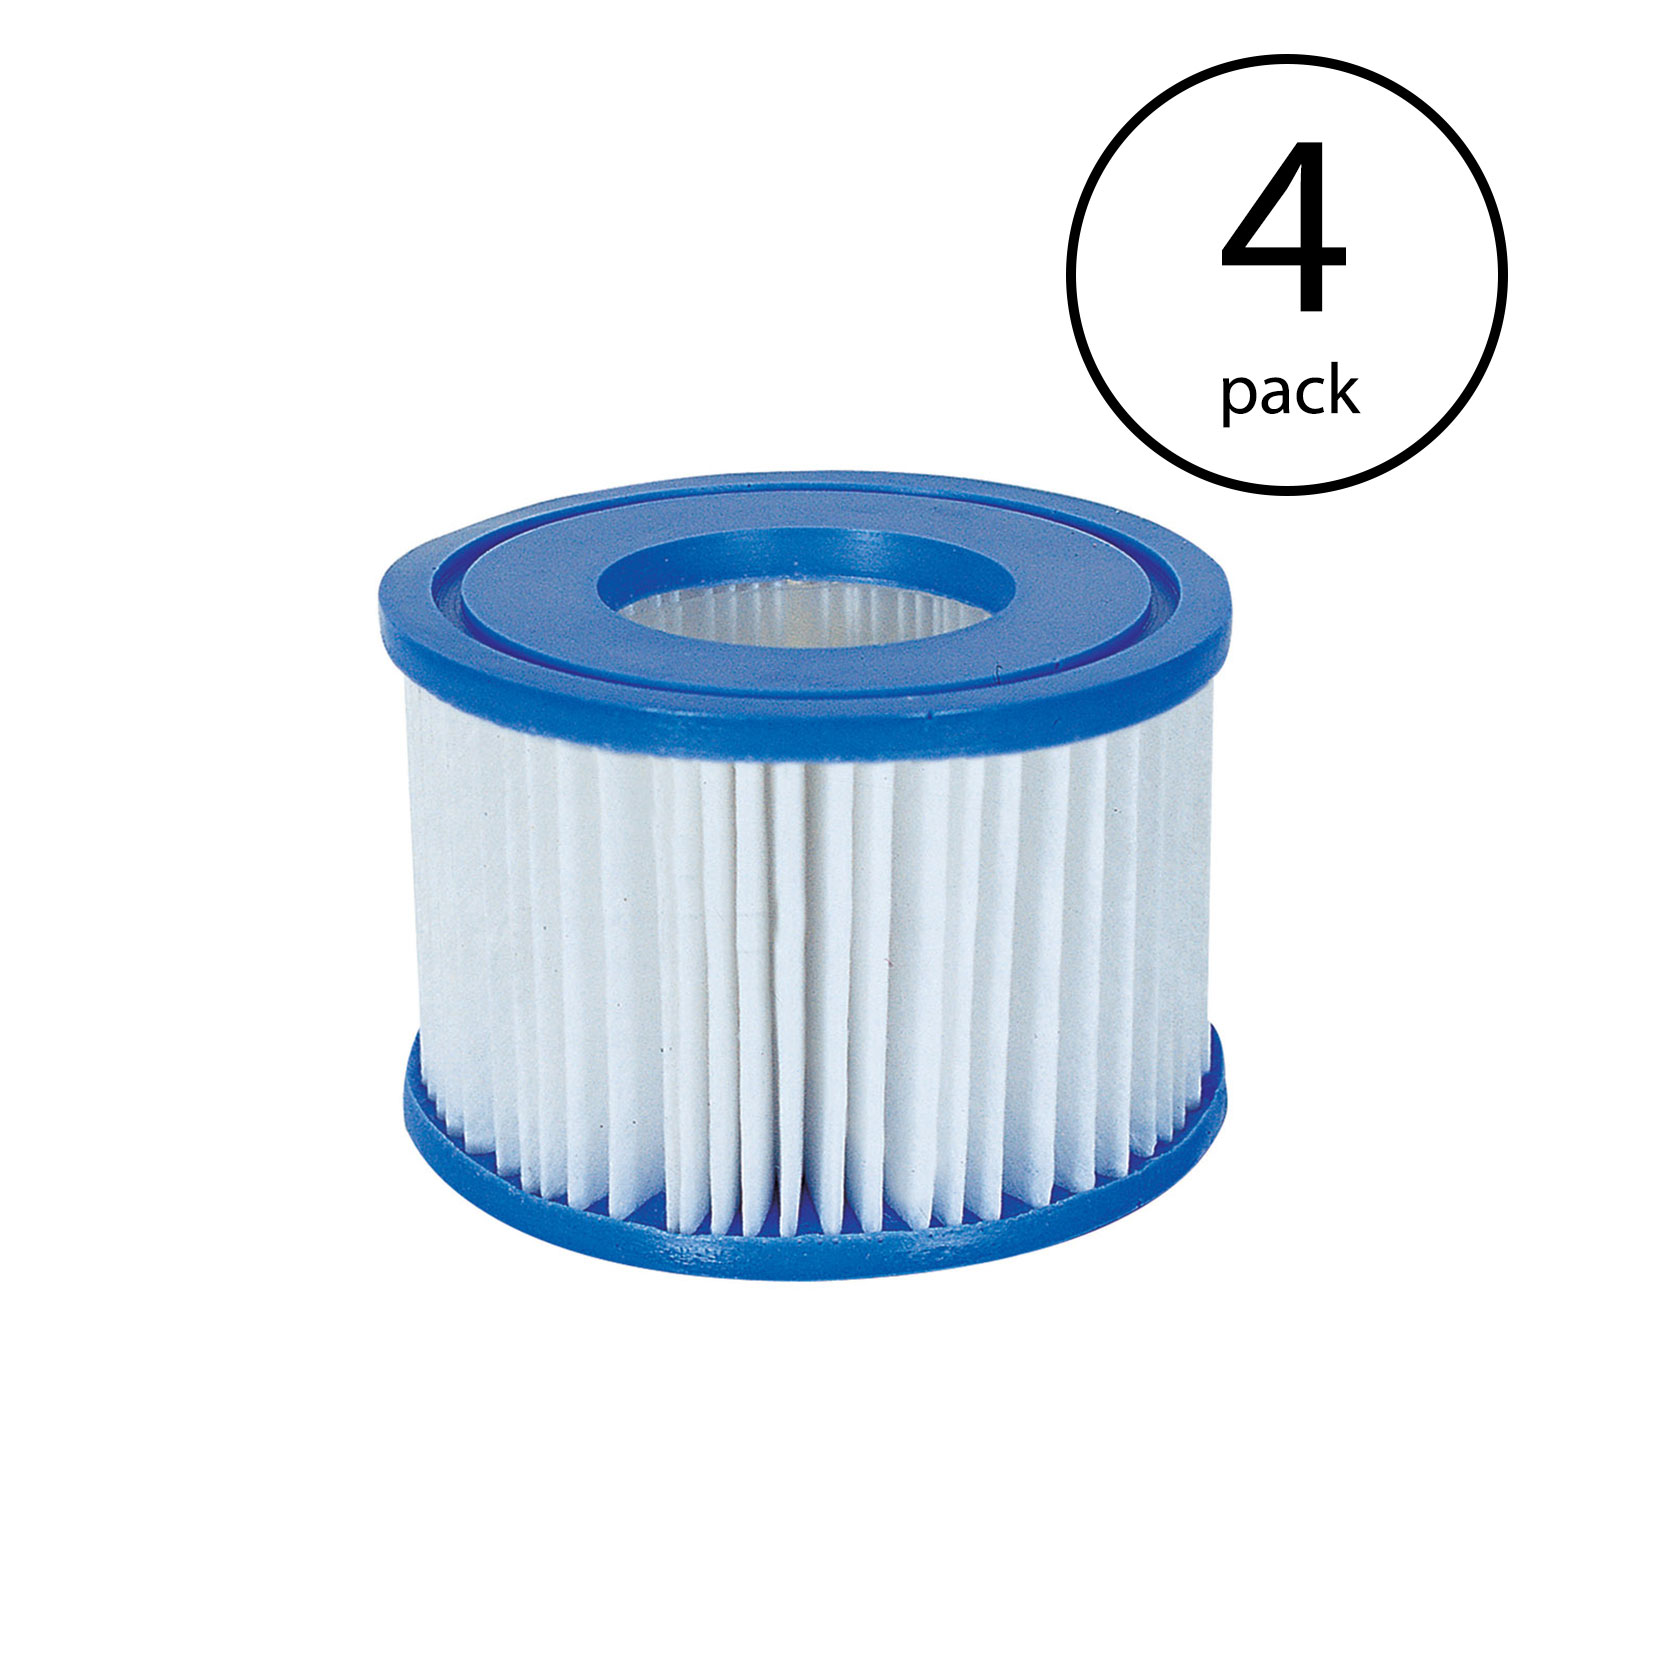 Bestway Spa Filter Pump Replacement Cartridge Type VI for SaluSpa (4 Pack)